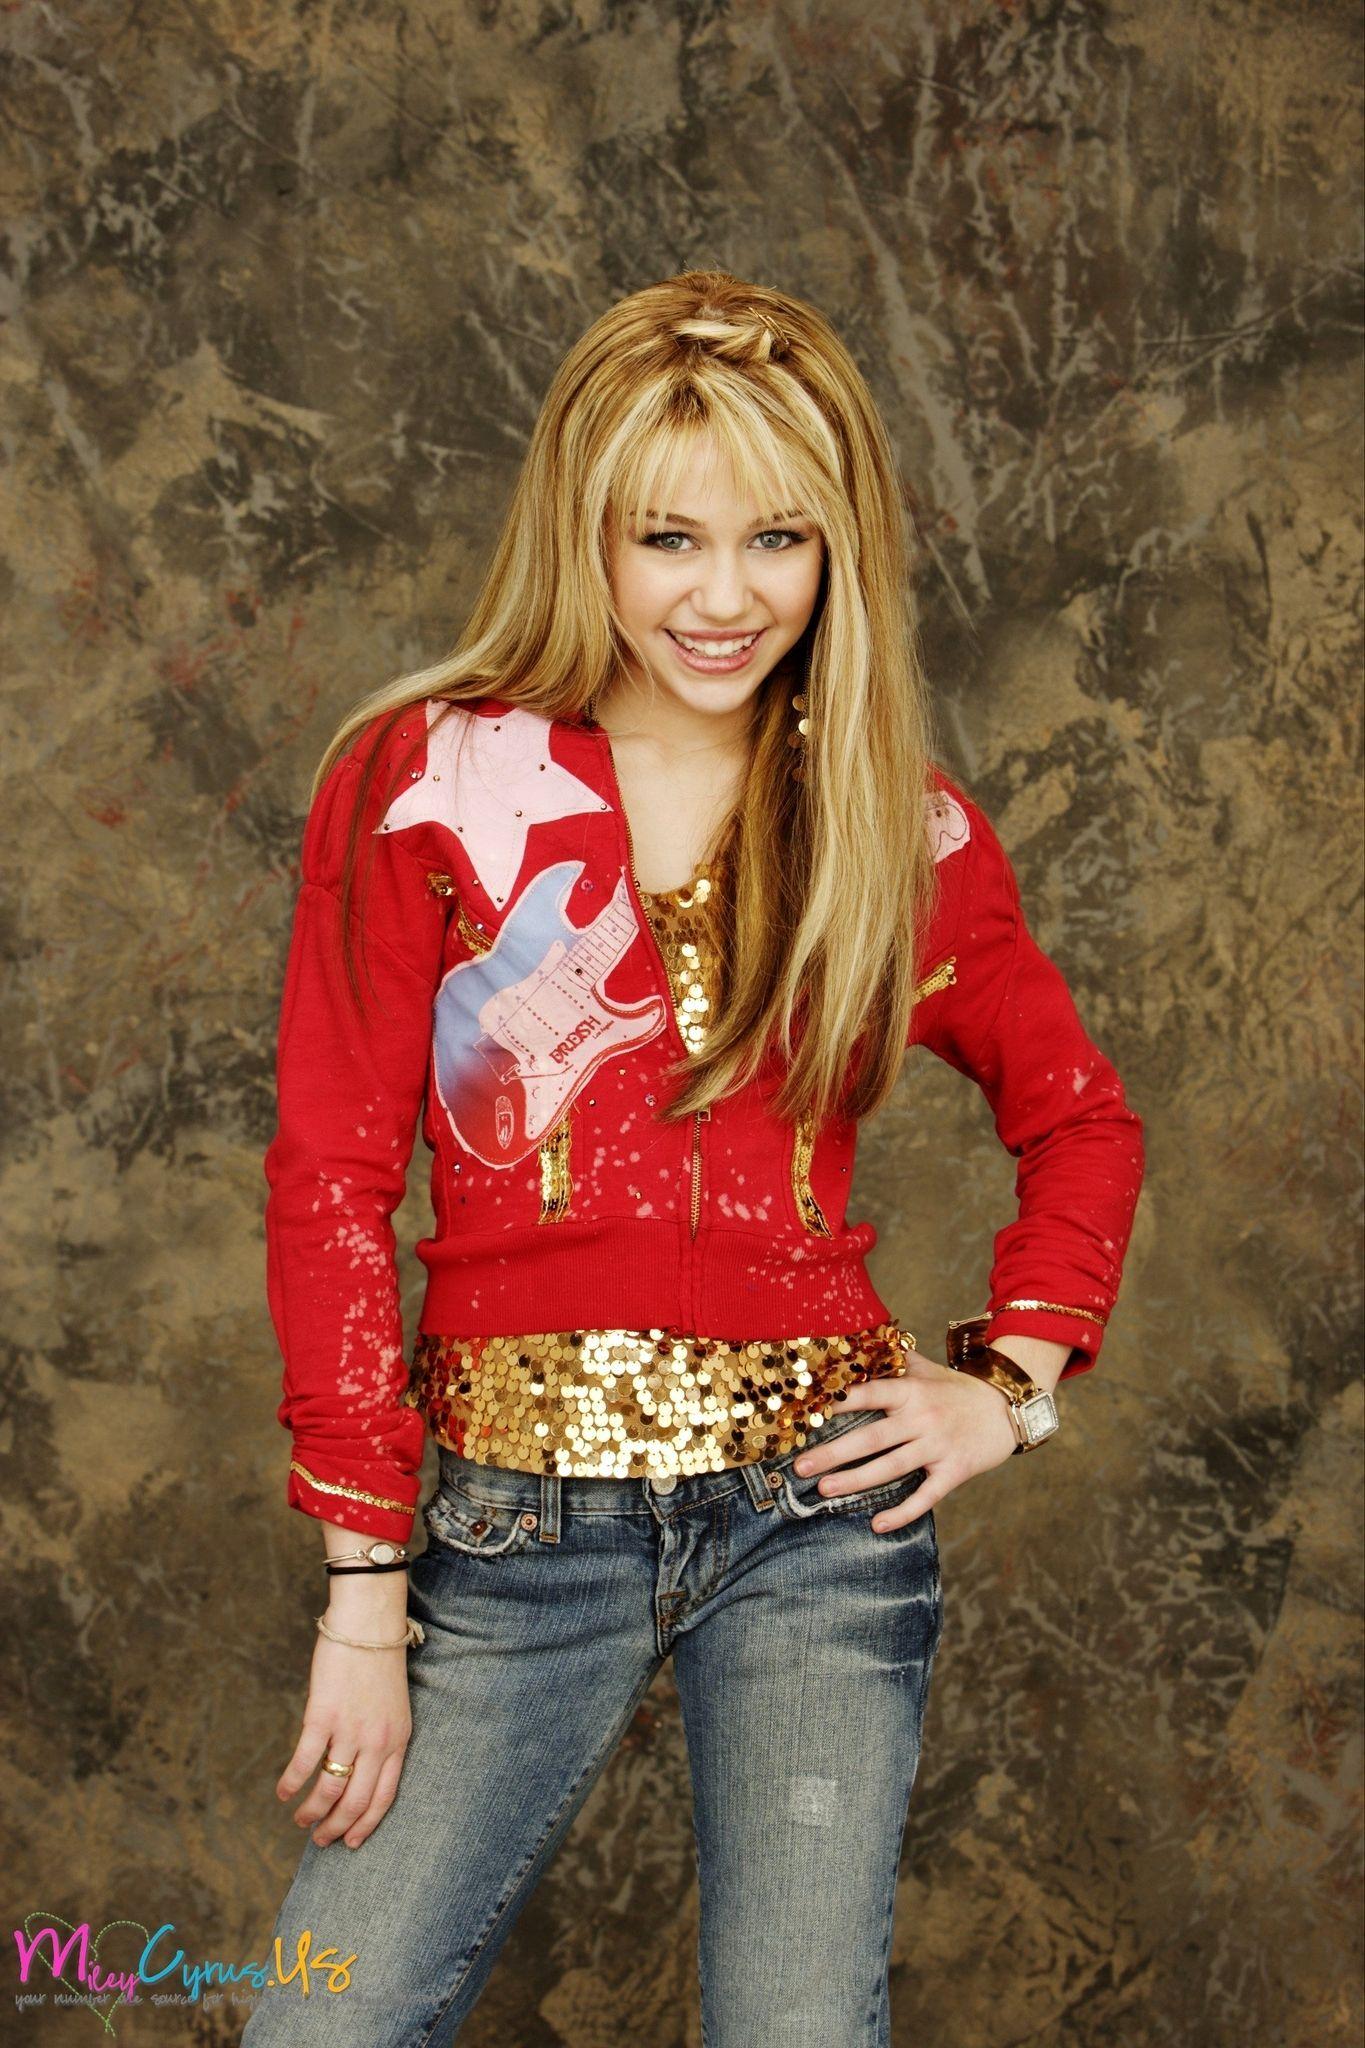 Miley Cyrus In Hannah Montana Wallpapers - Hannah Montana Season 1 Photoshoot , HD Wallpaper & Backgrounds